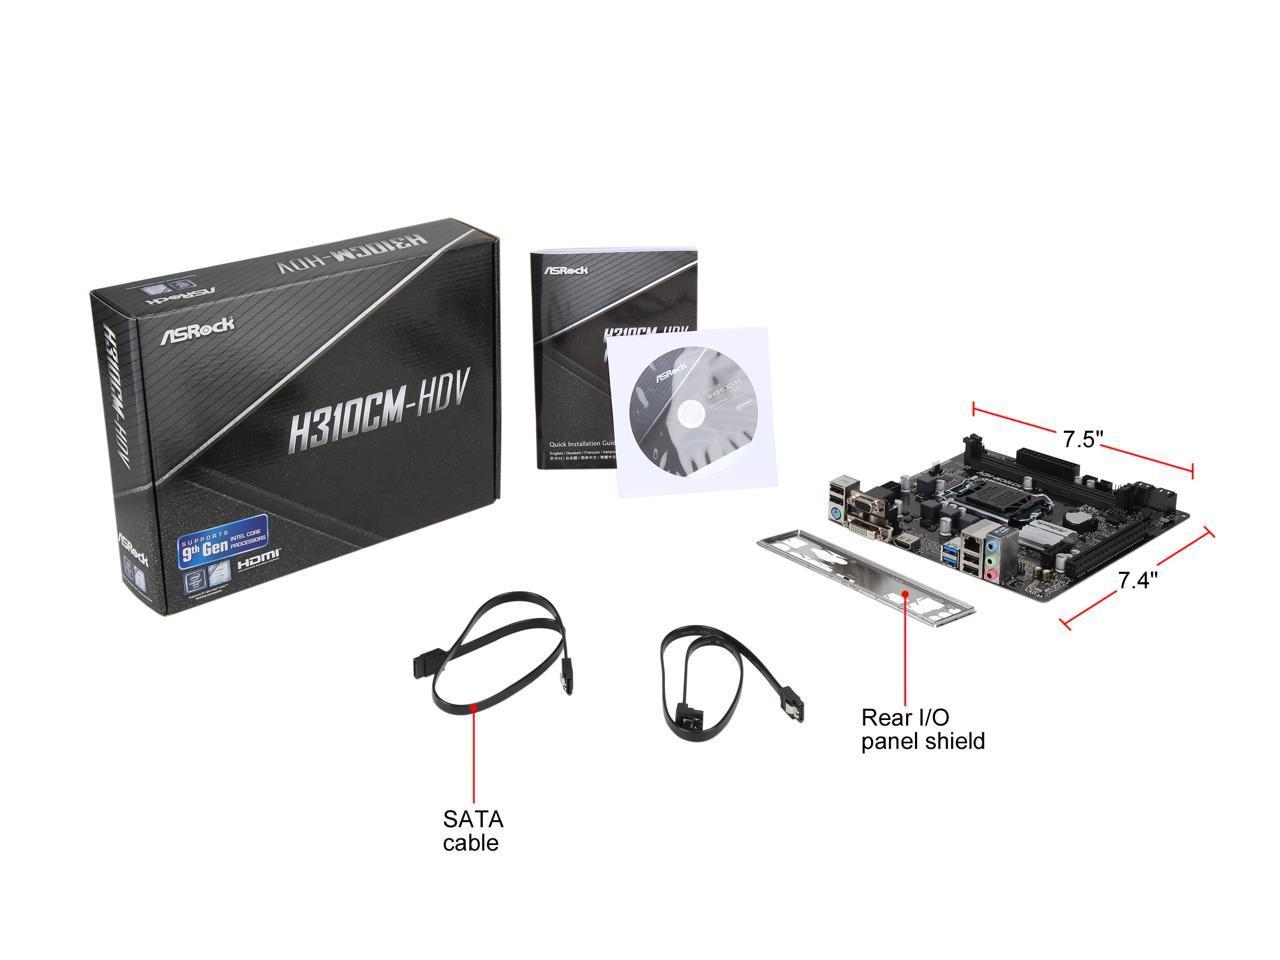 ASRock H310CM-HDV LGA 1151 300 Series Intel H310 HDMI SATA 6Gb//s USB 3.1 Micro